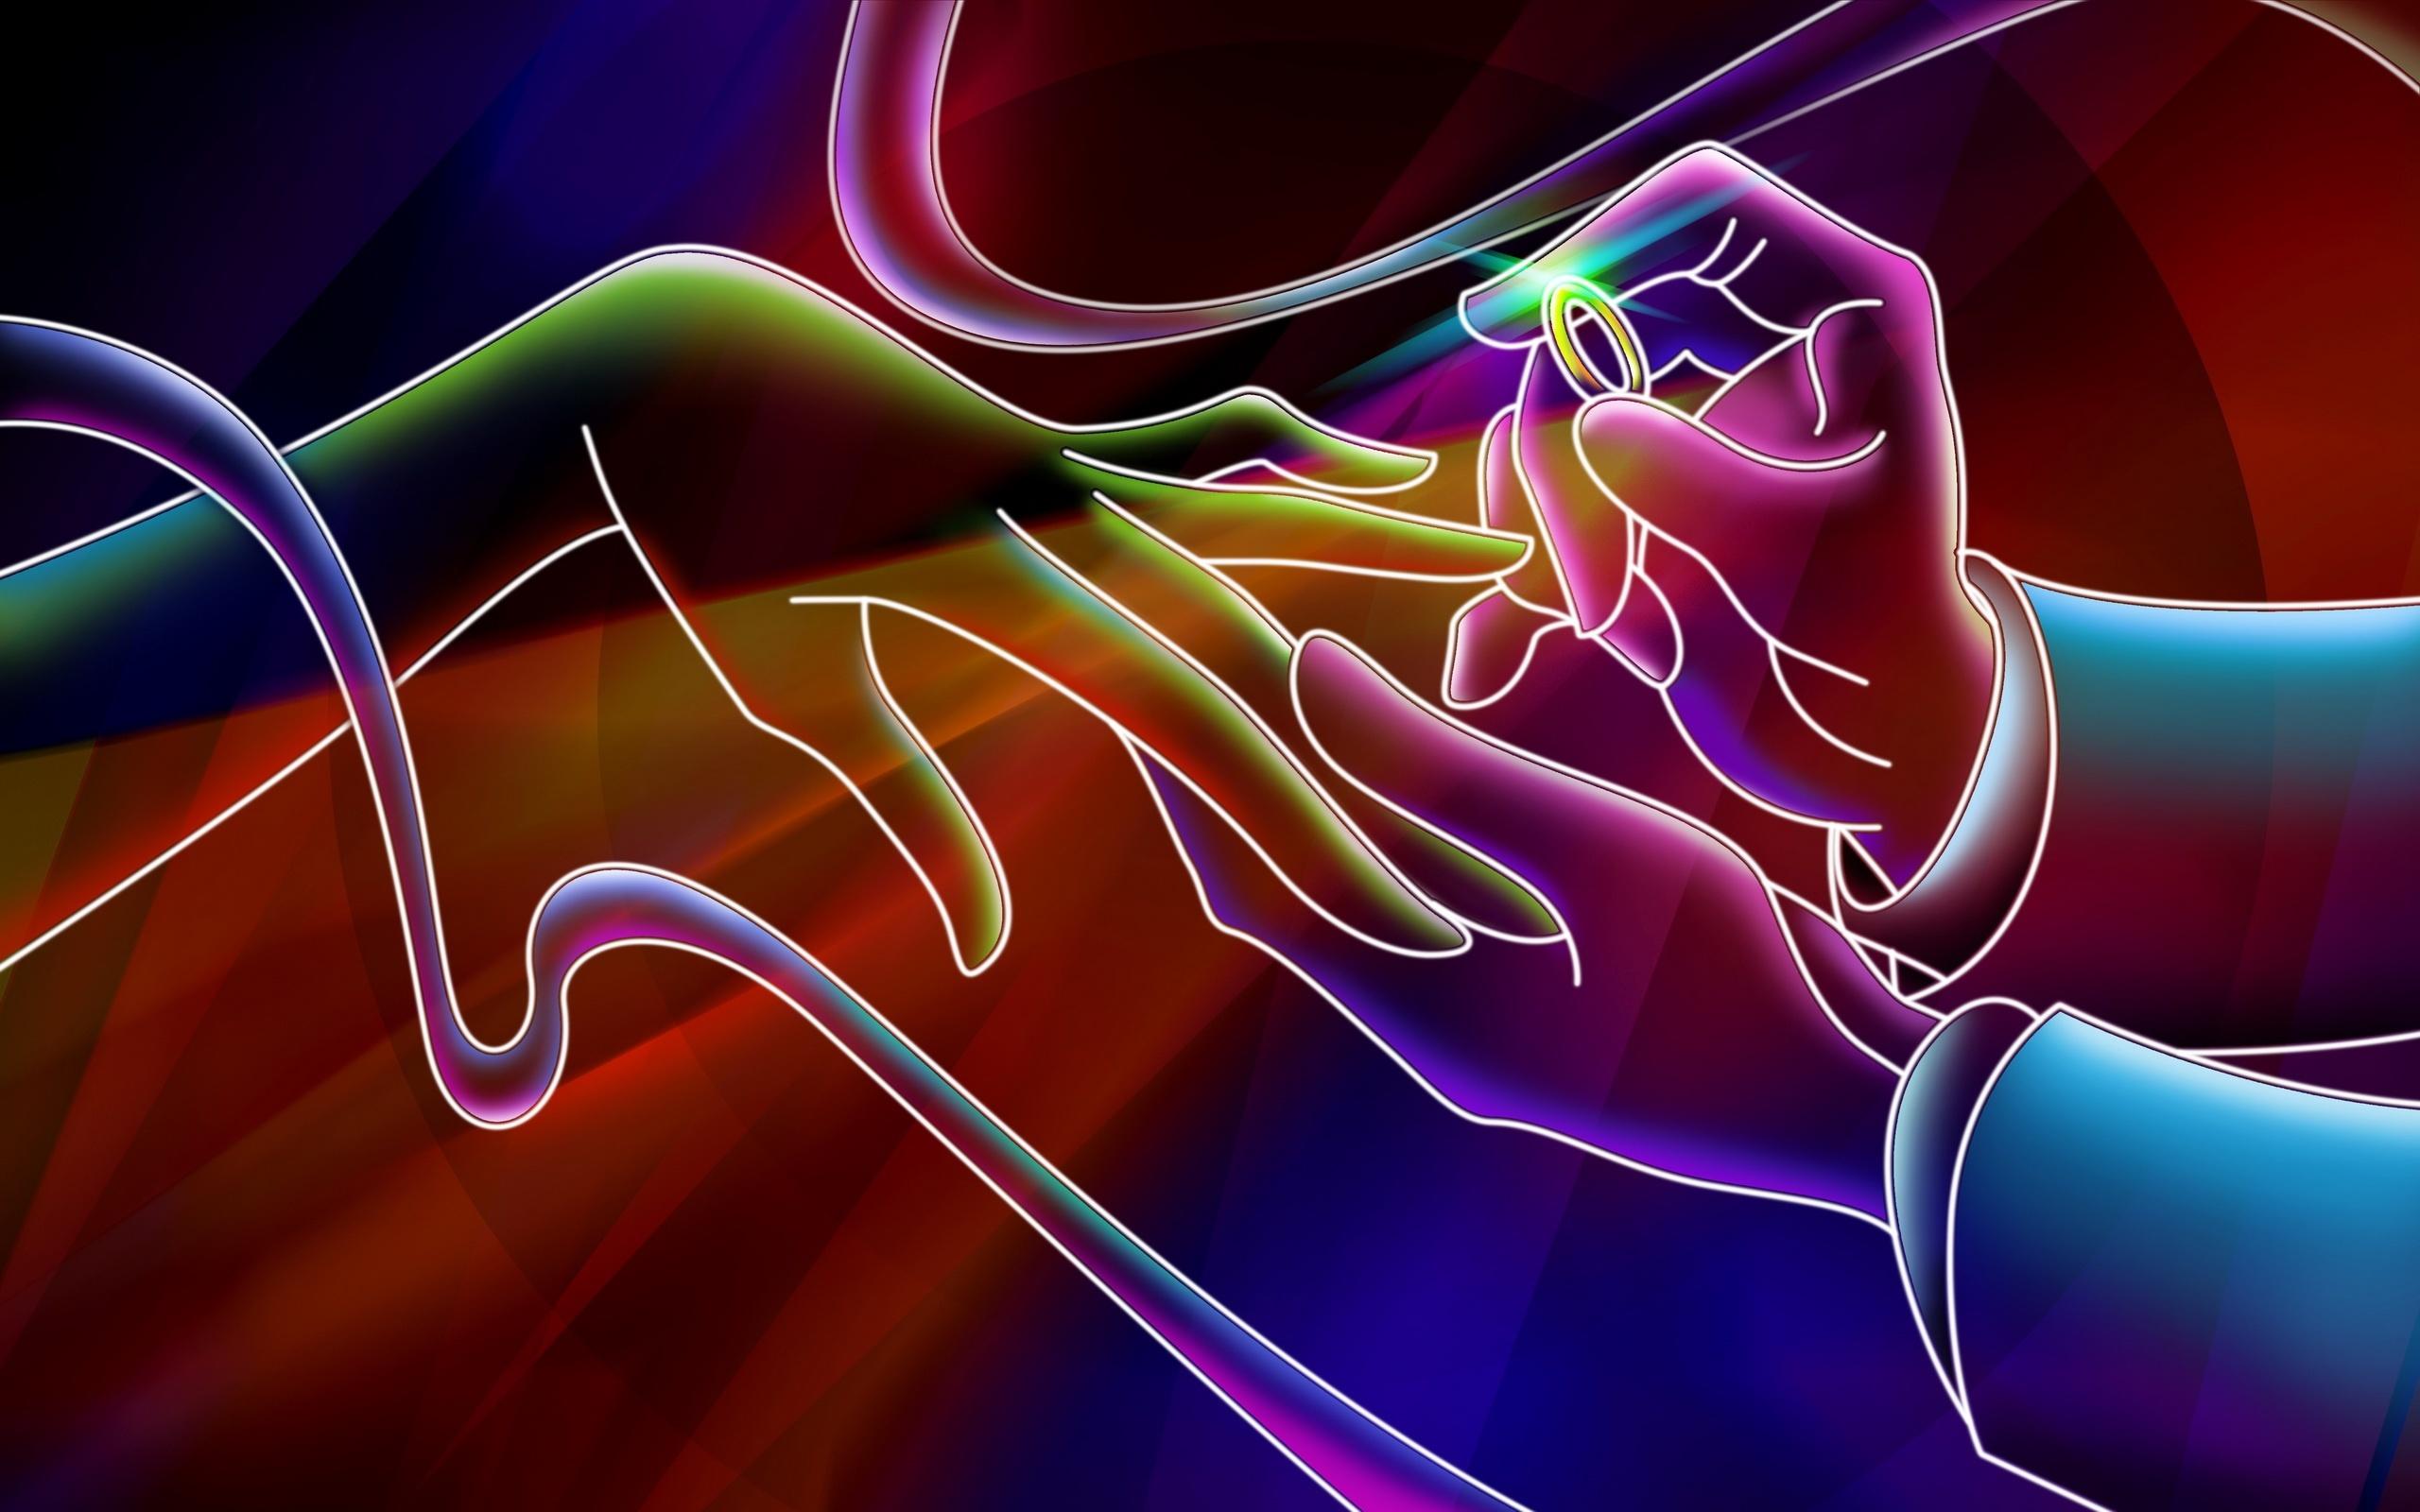 neon wallpaper background 2560x1600